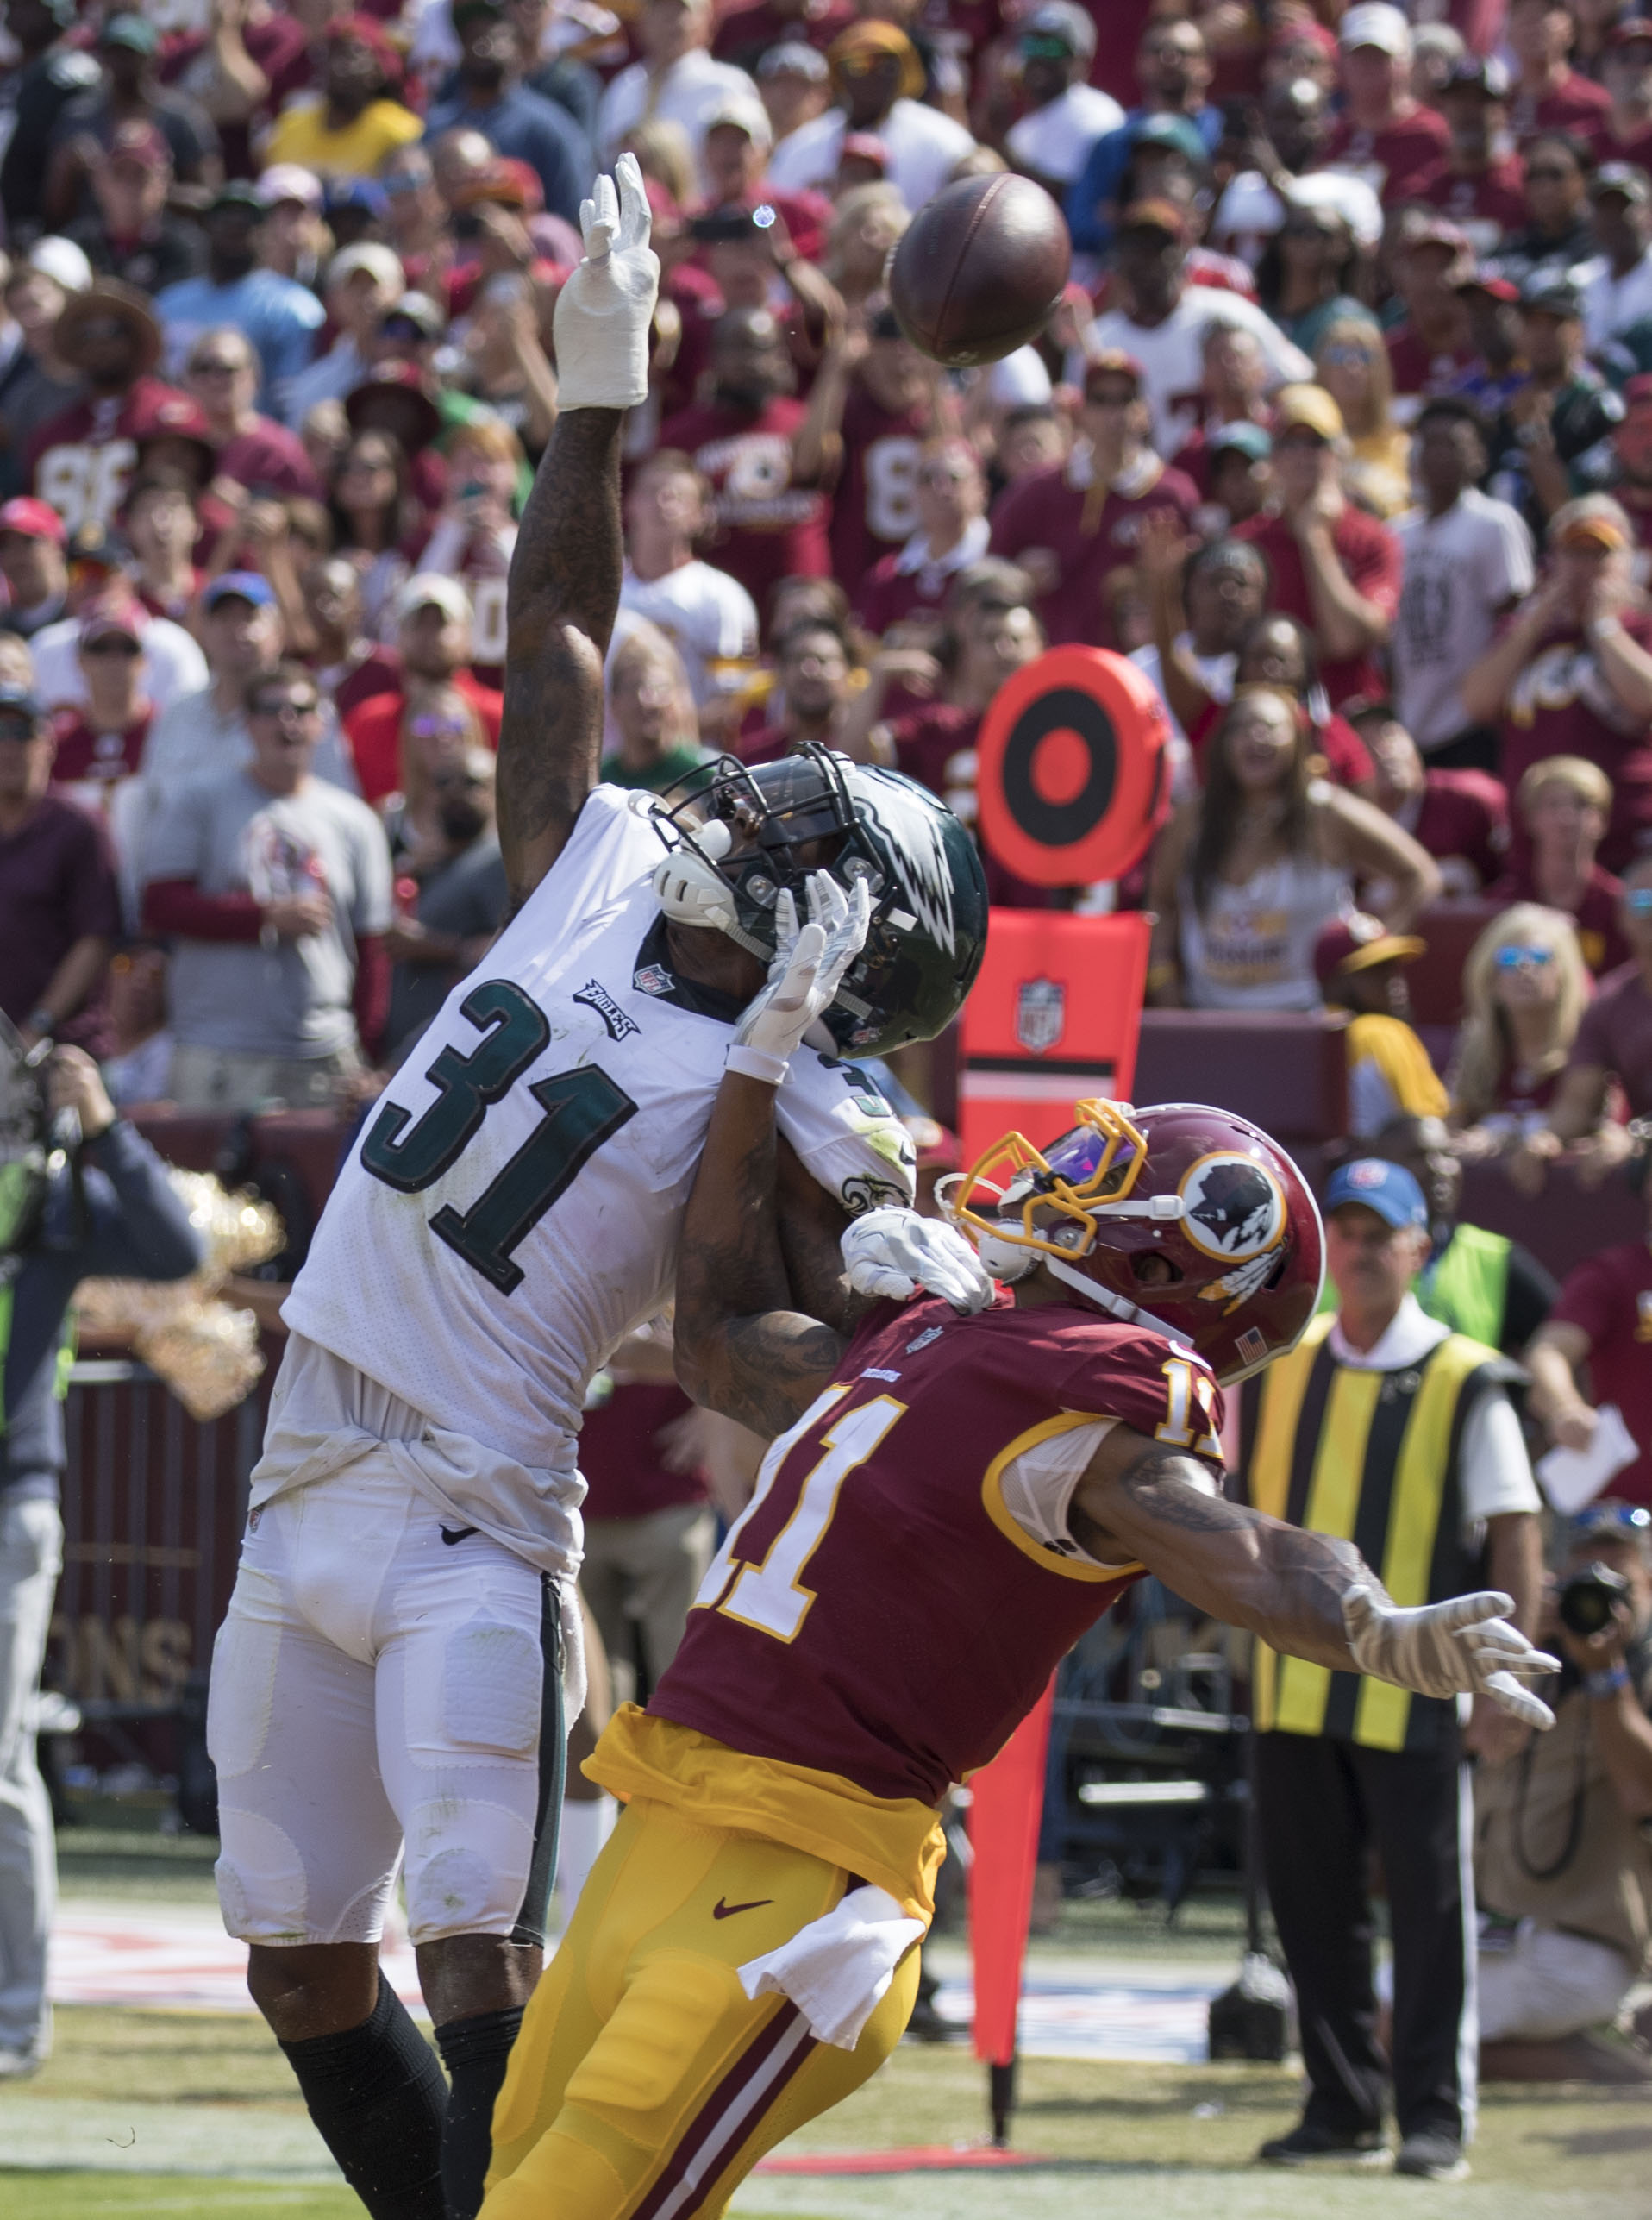 701900e3f46 Mills deflecting pass vs Redskins week 1, 2017